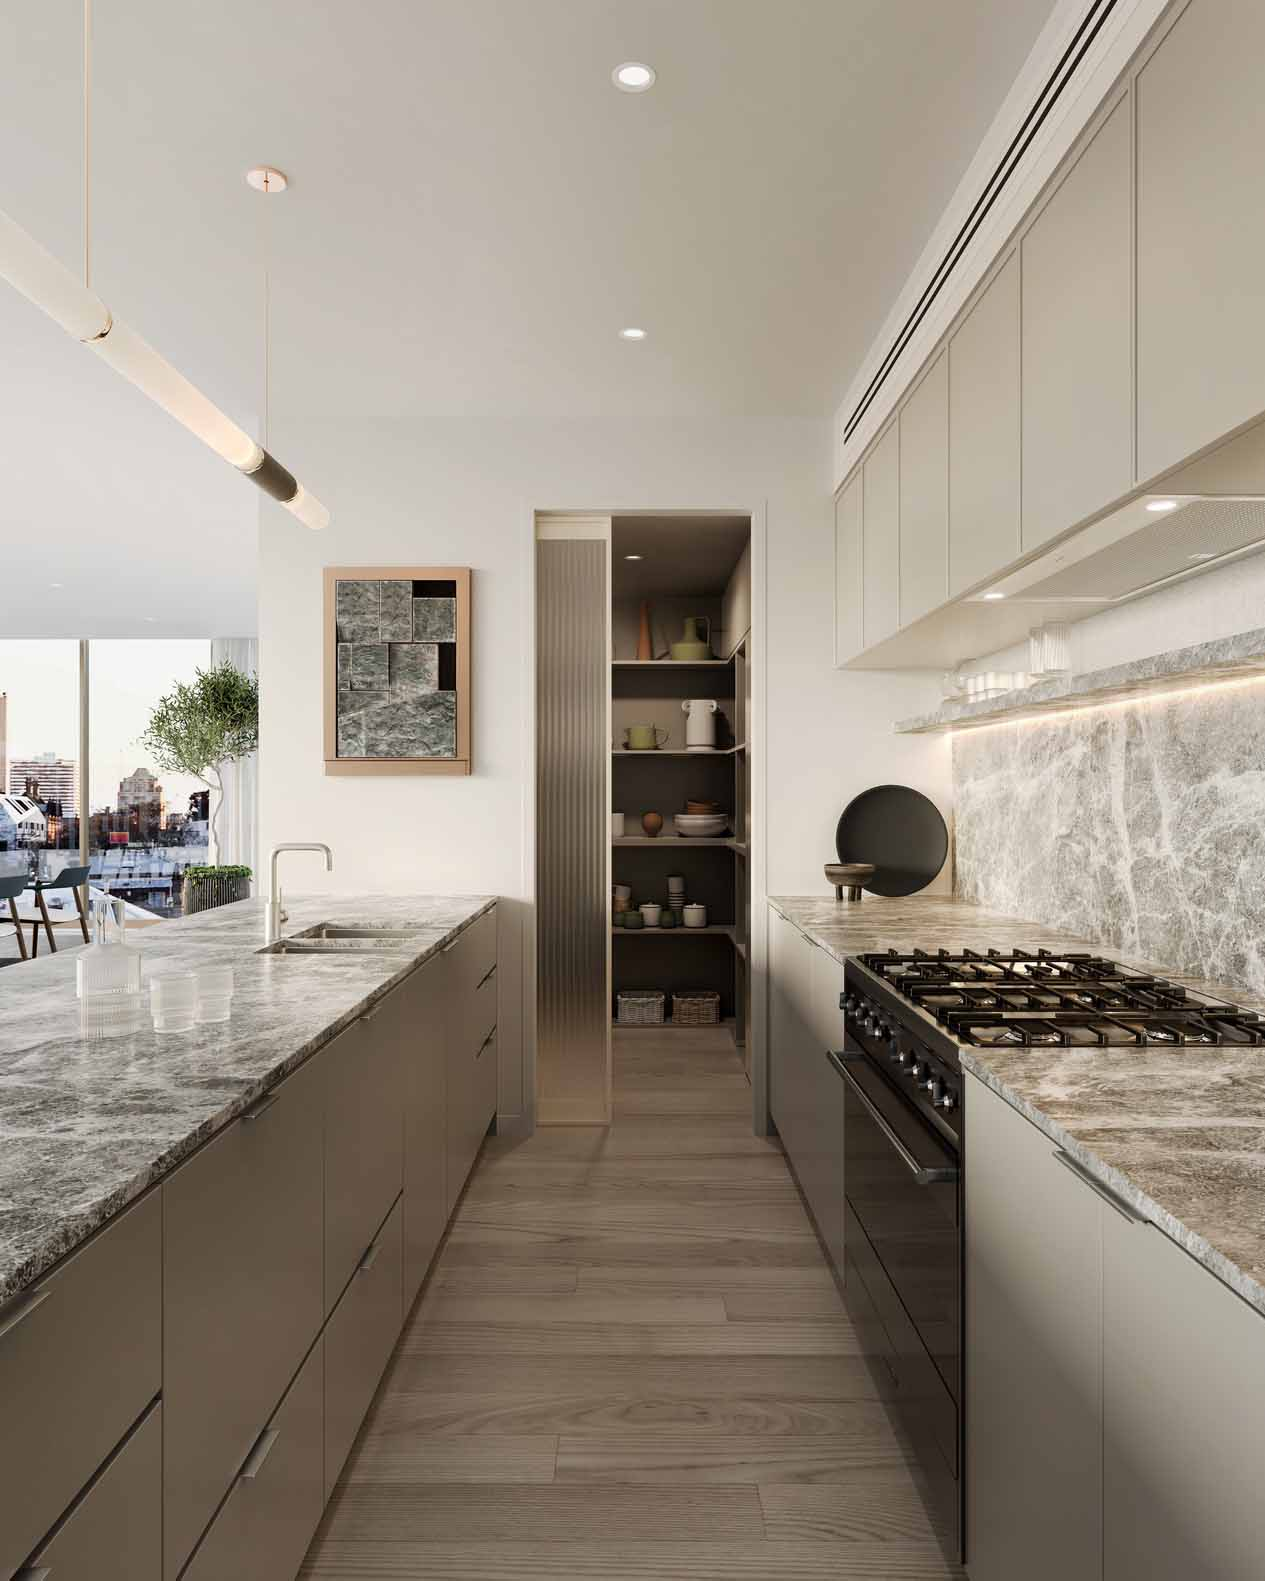 C&L-Residencies-Collingwood-3D-architectural-visualisation-kitchen-FKD-Studio